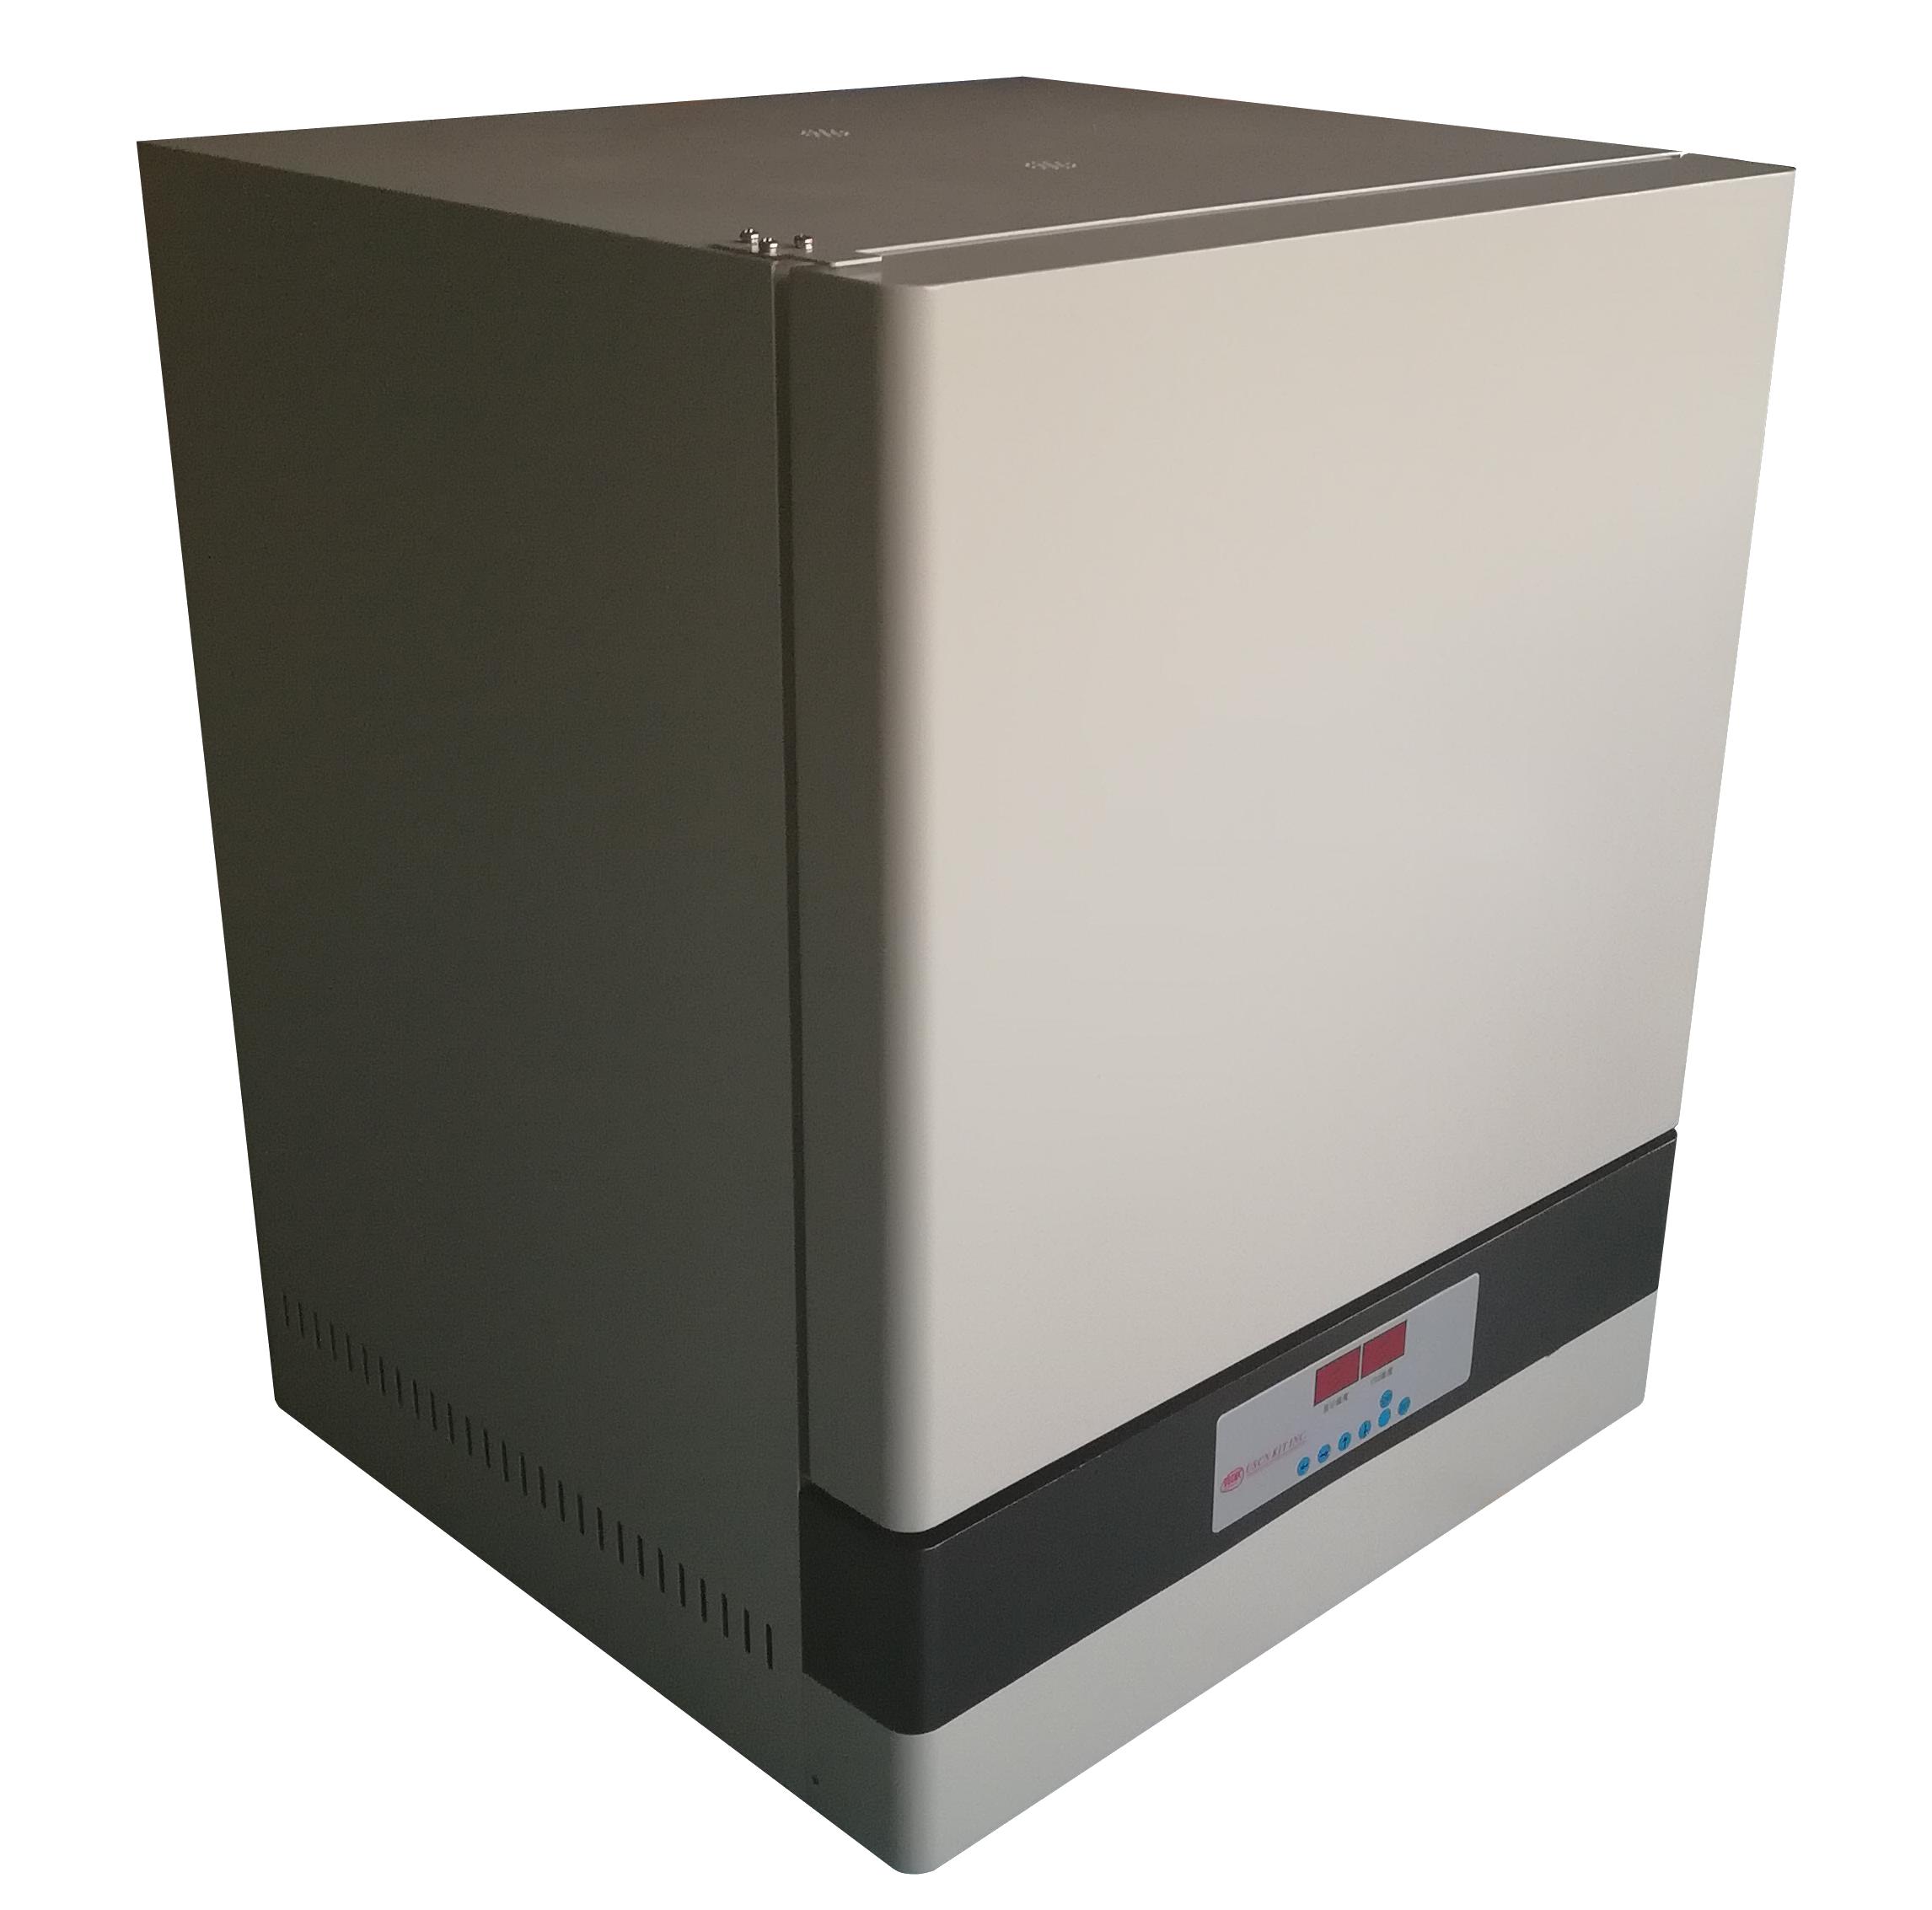 Smart Electric Heated CO2 Constant Temperature IncubatorSCI17.1